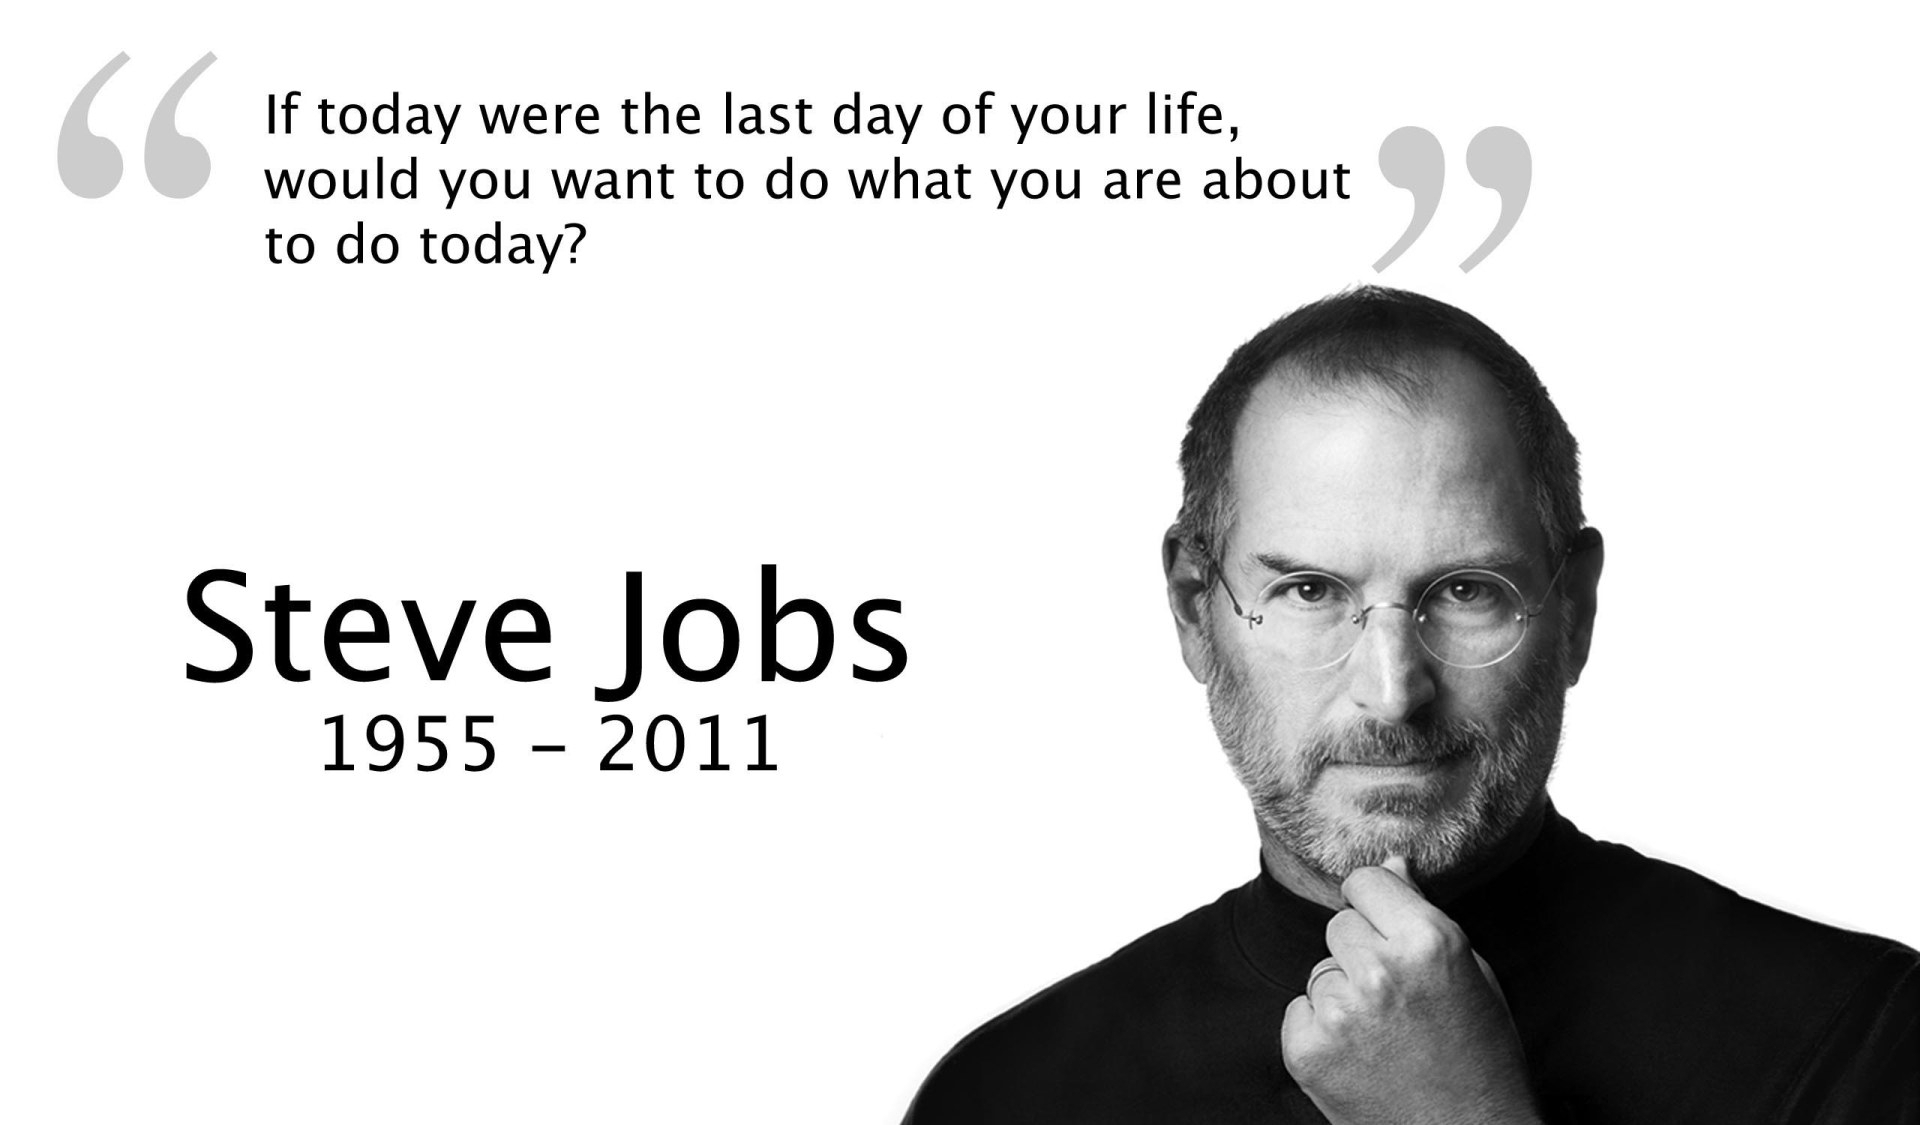 steve jobs quote on future.jpg